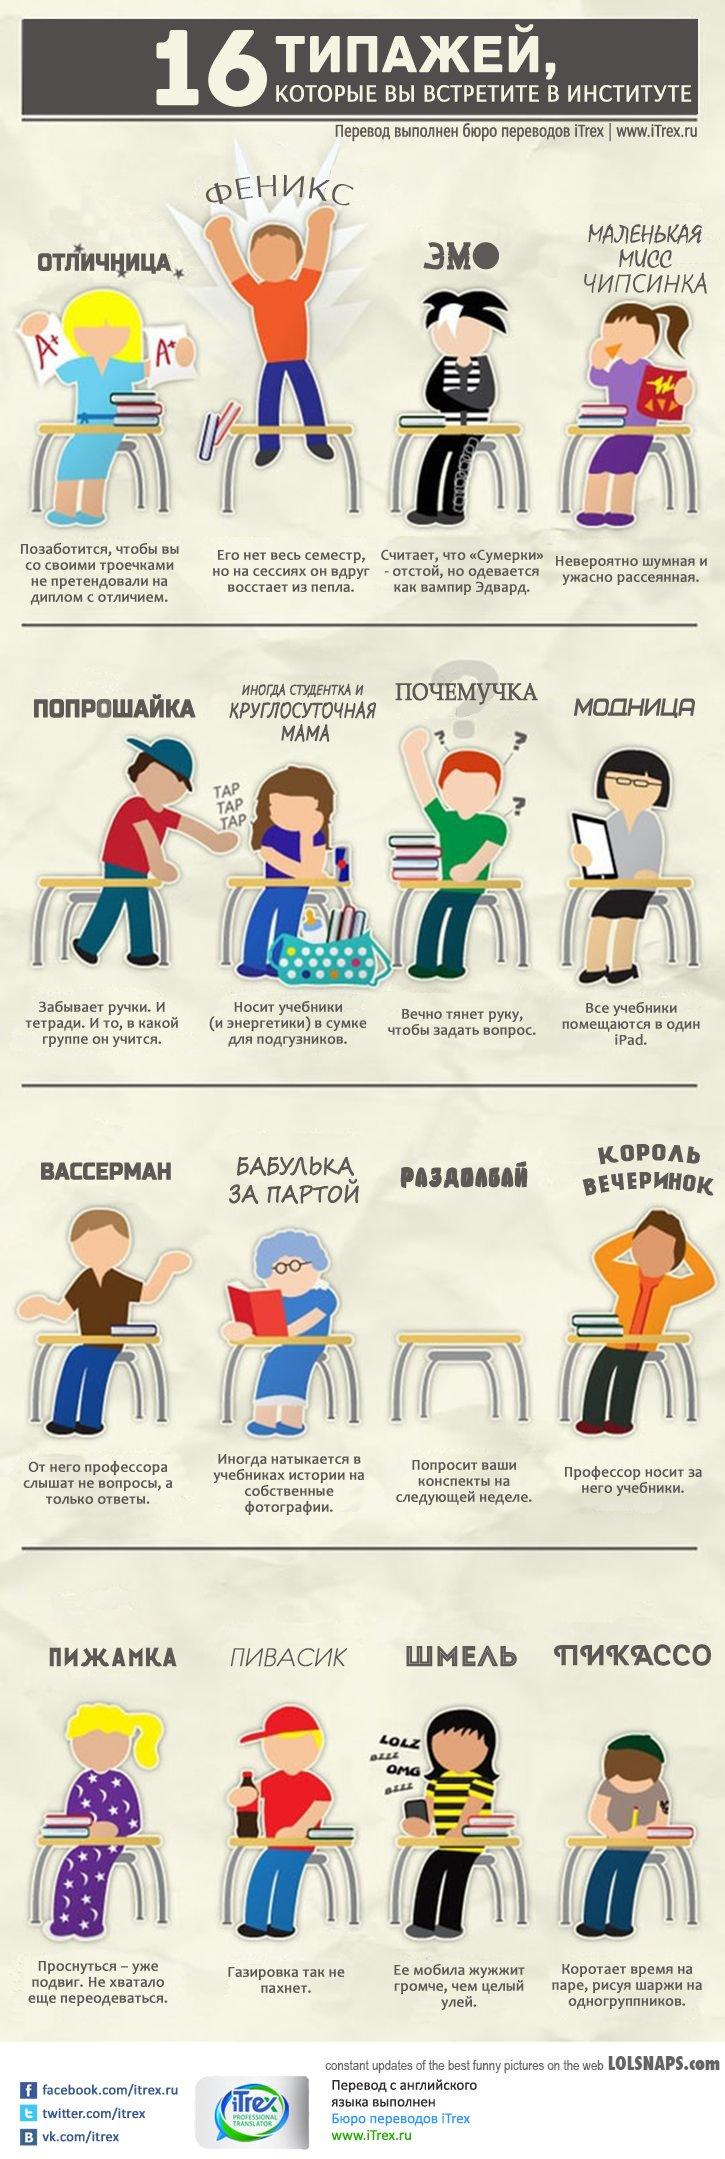 16 tipov studentov